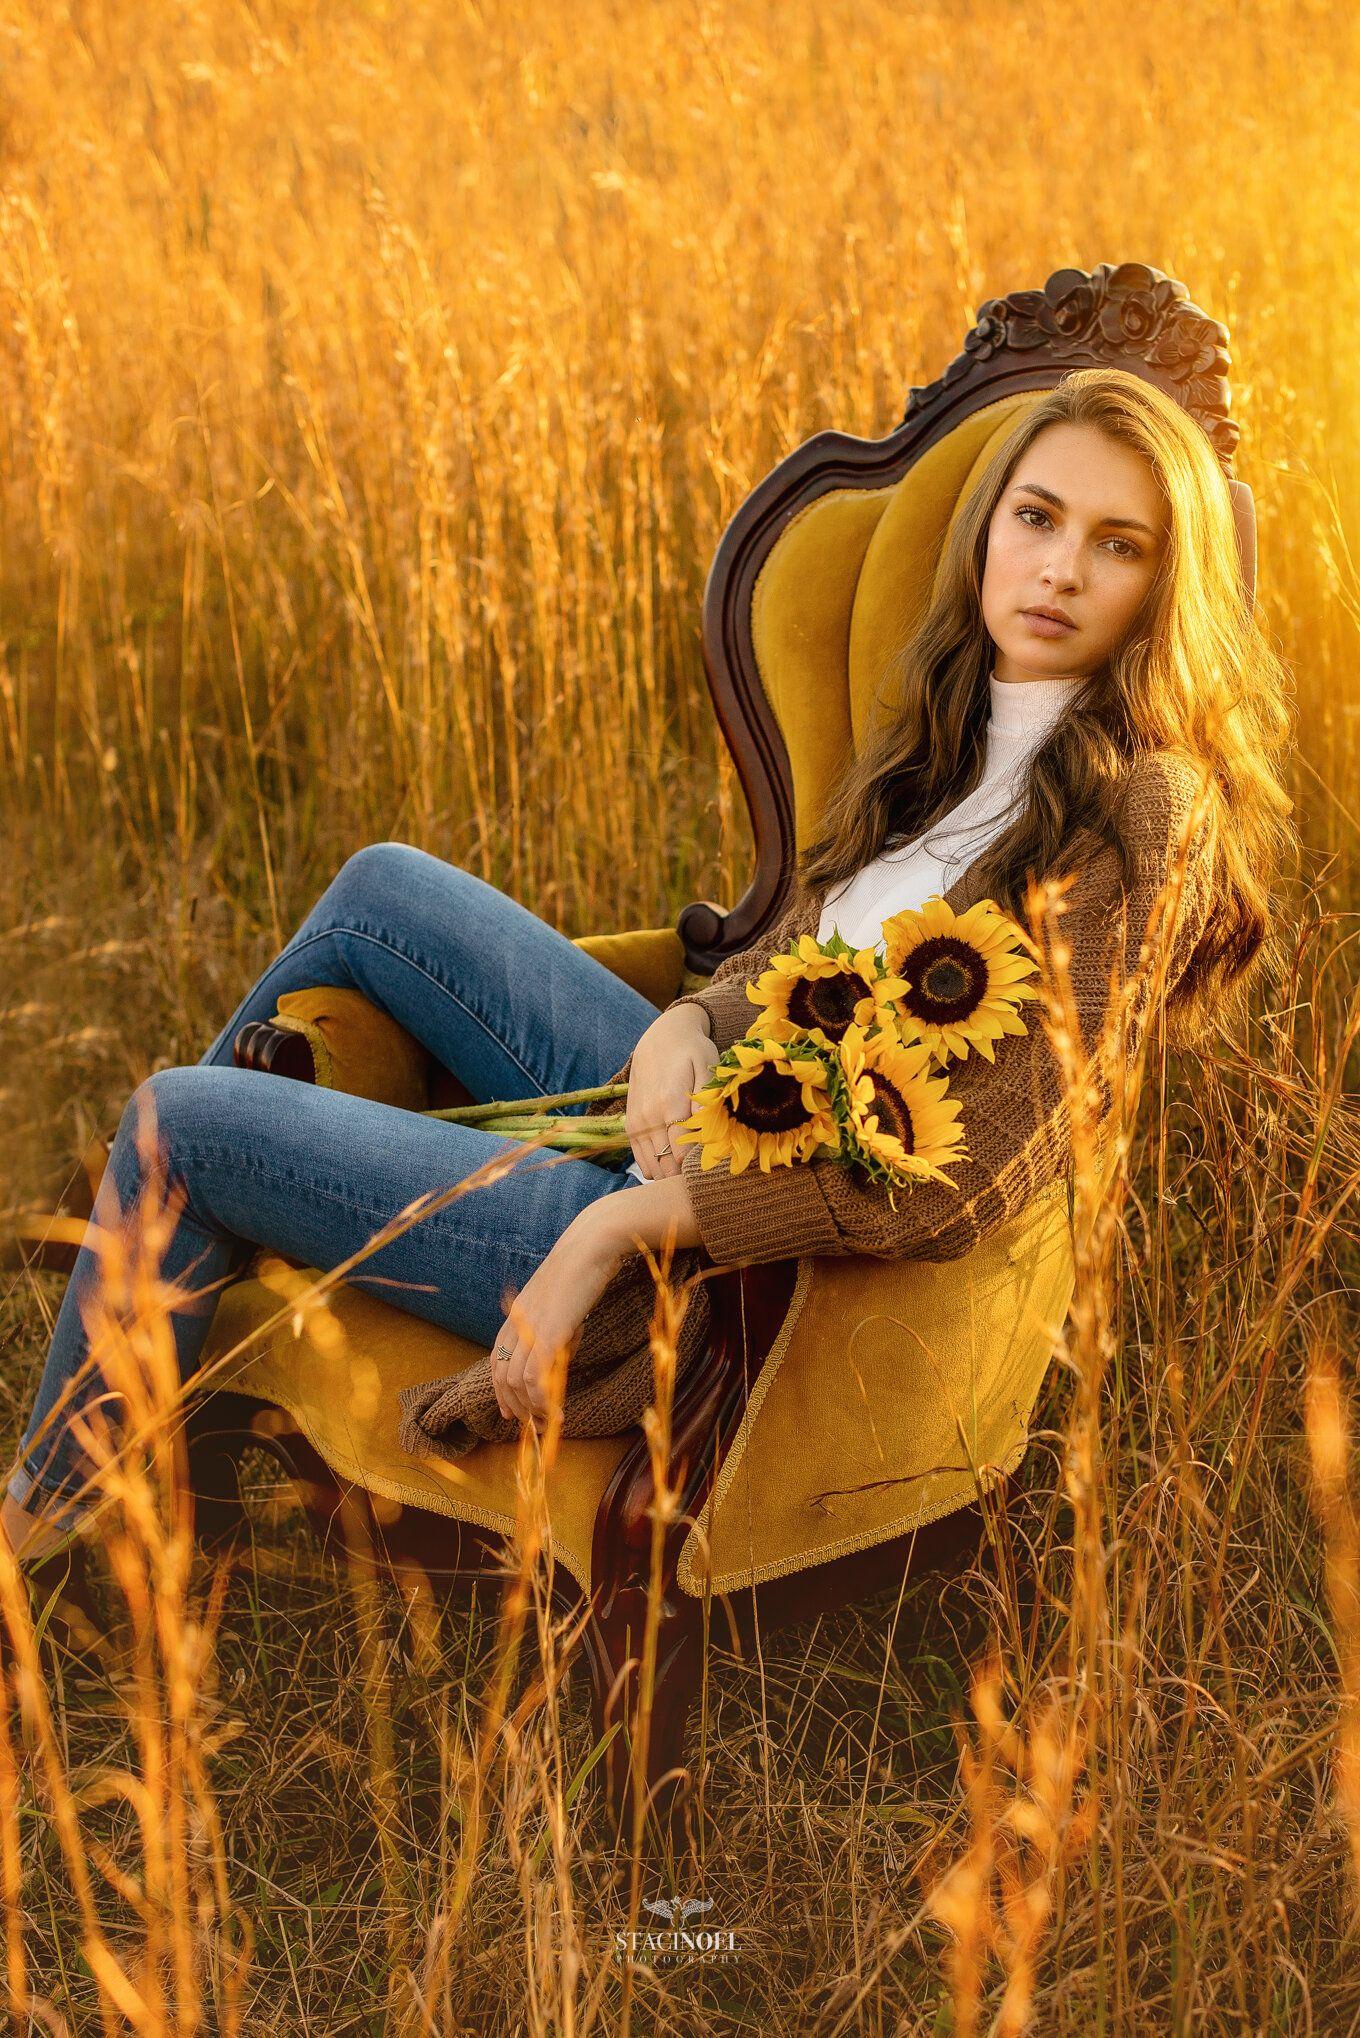 harrisburg-nc-senior-portraits |hickory ridge high school